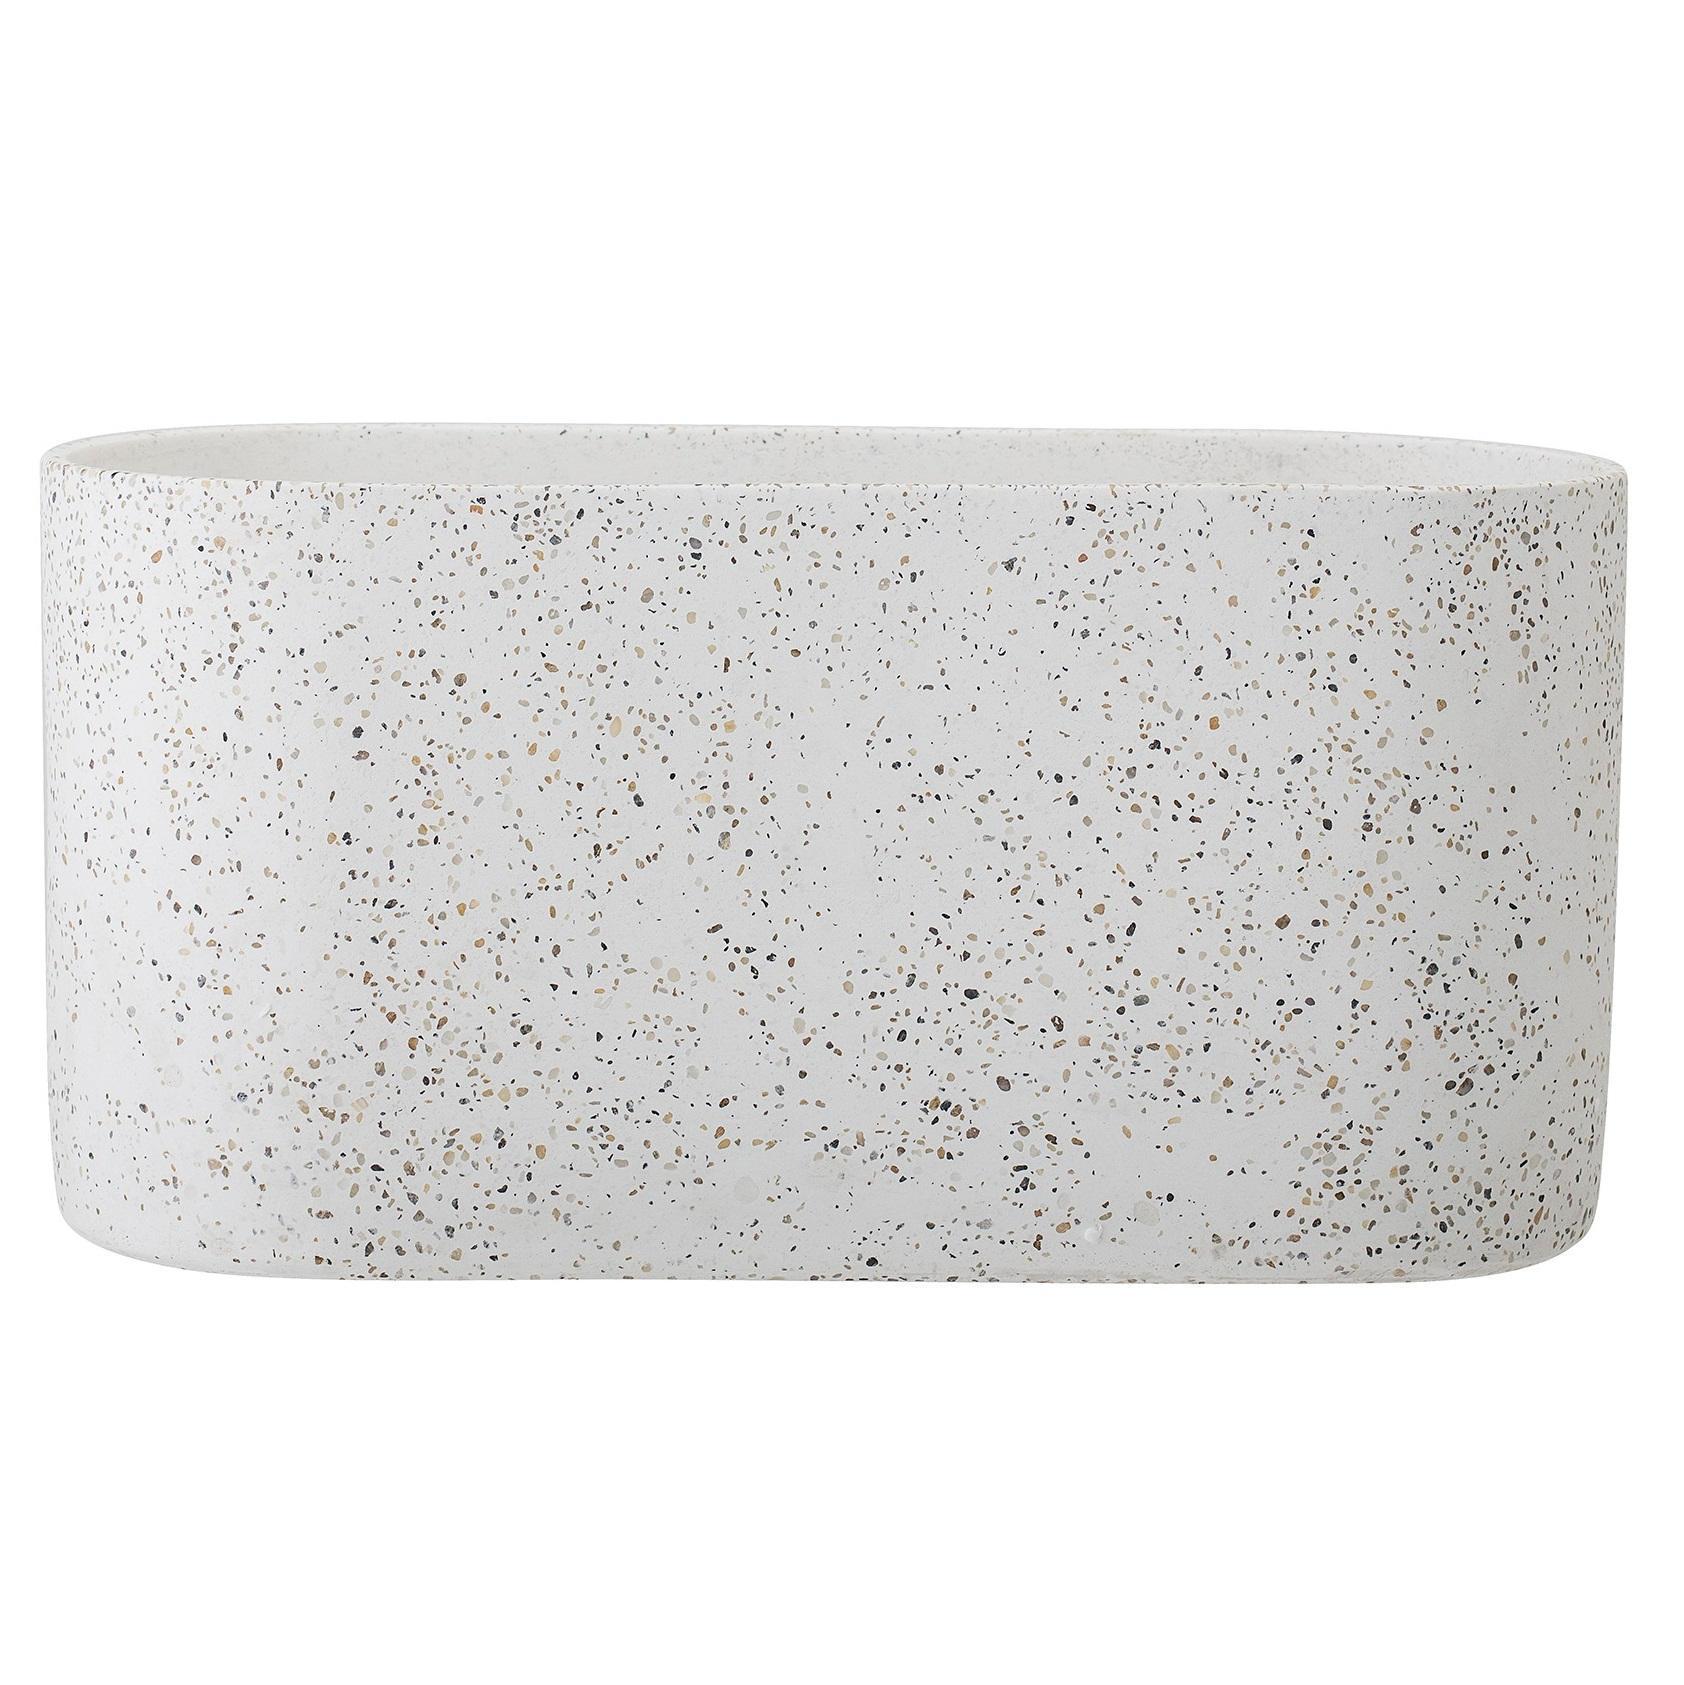 Bloomingville Betonový květináč Terrazzo, béžová barva, bílá barva, multi barva, beton